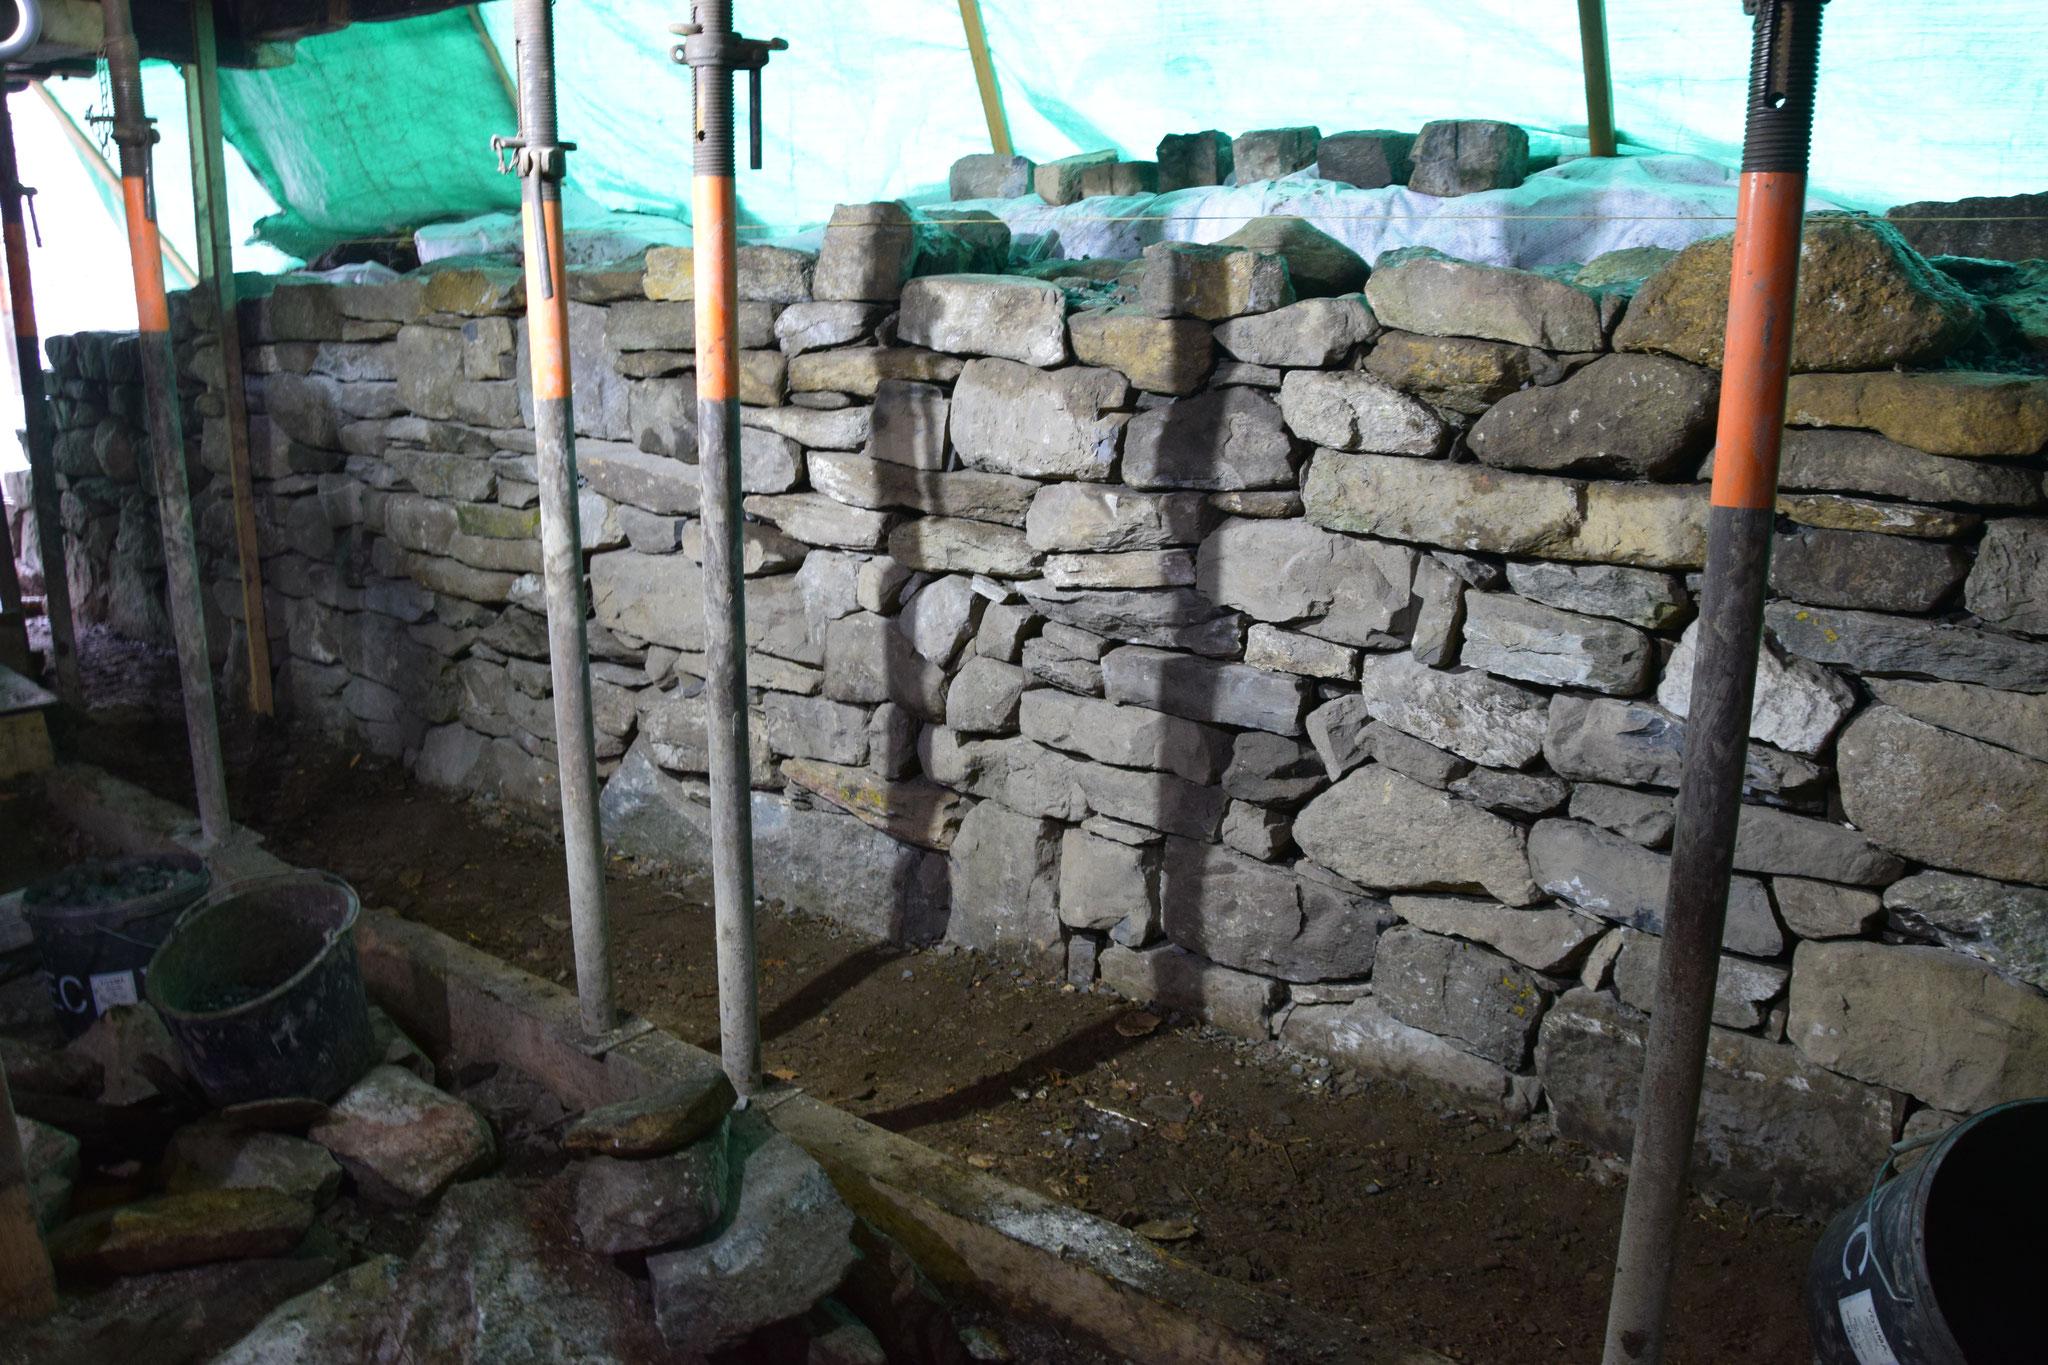 Trockensteinmauer in Bearbeitung